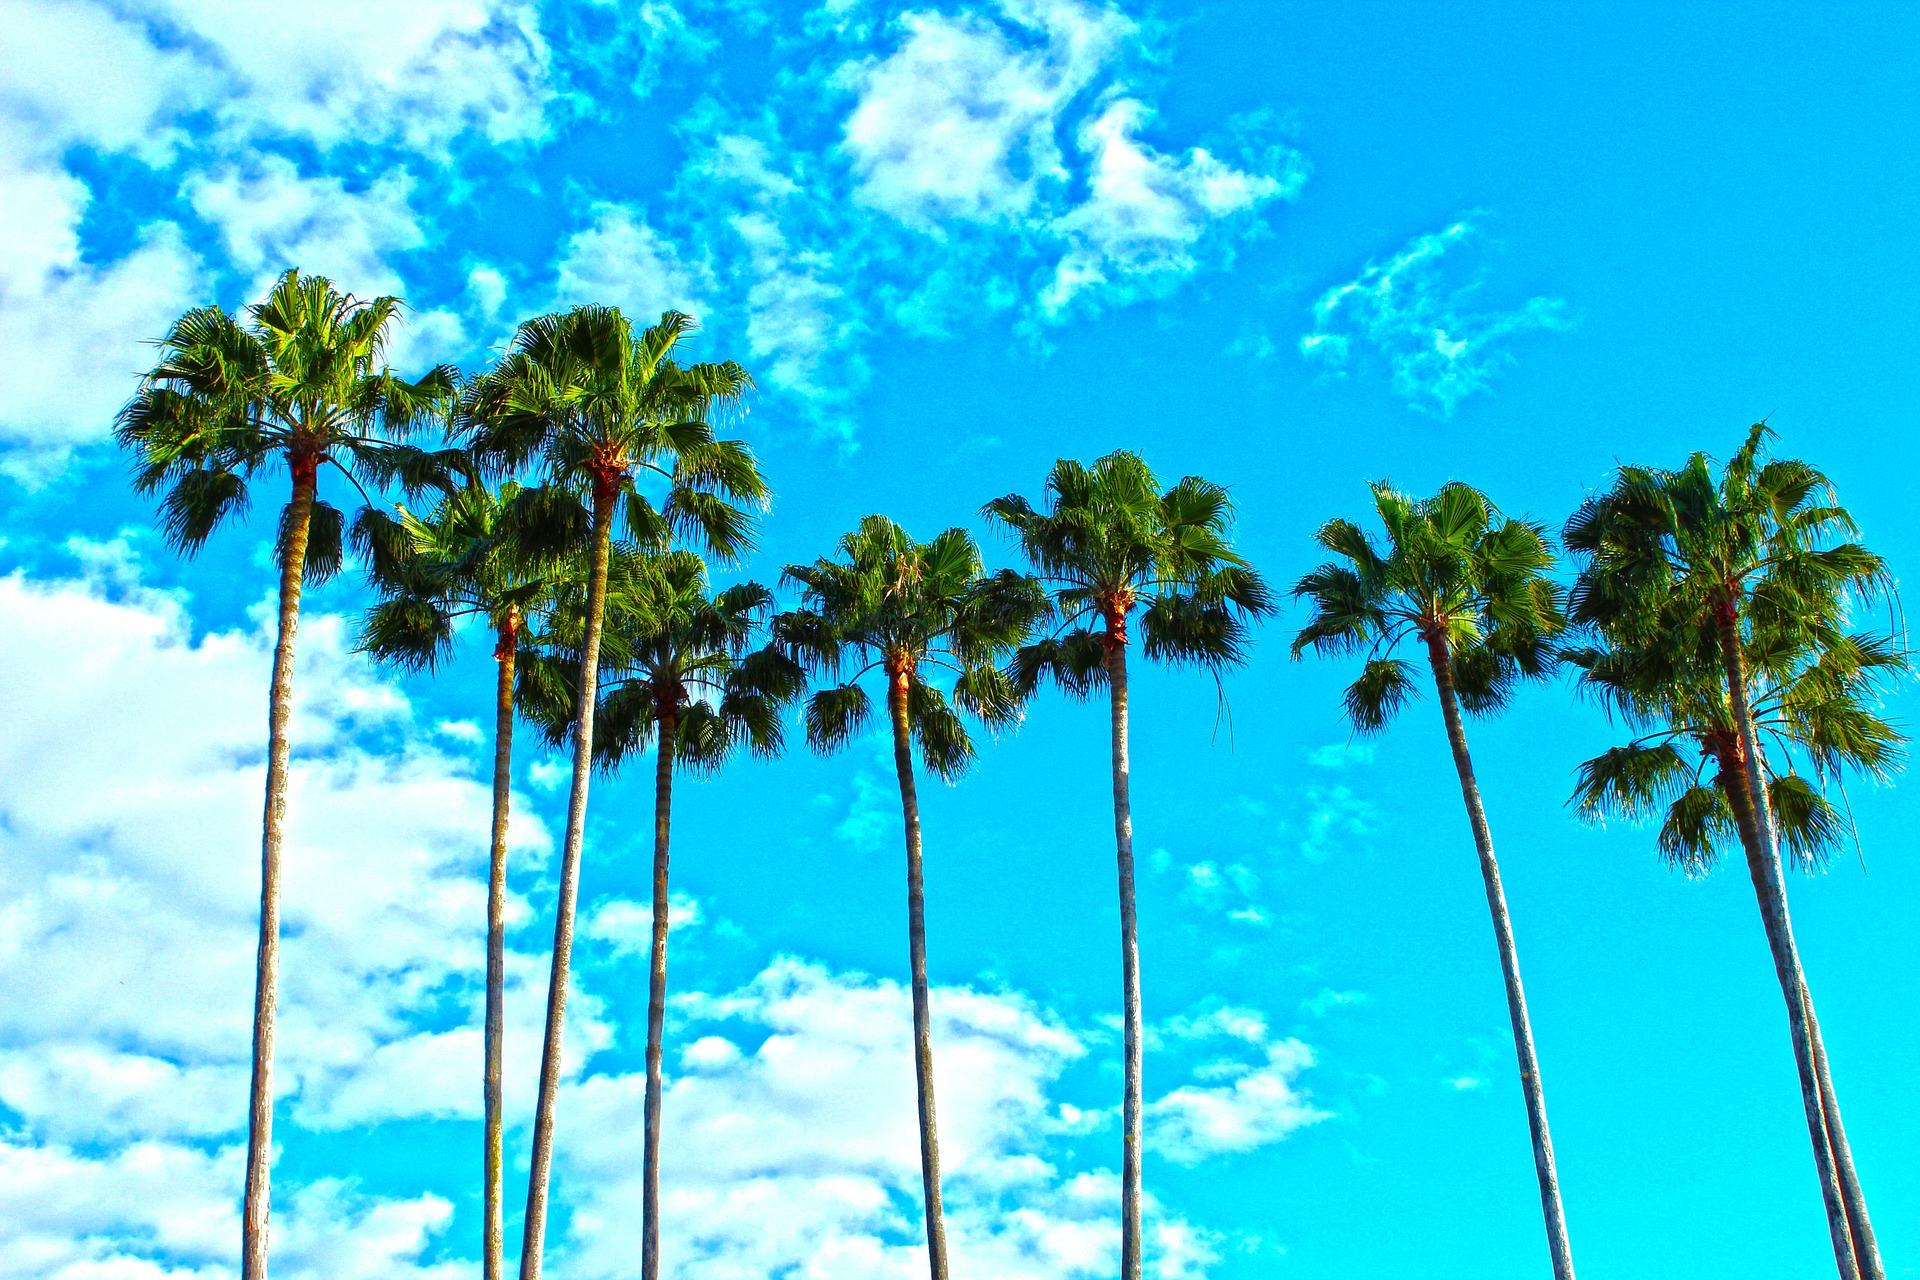 palm-trees-1277243_1920.jpg